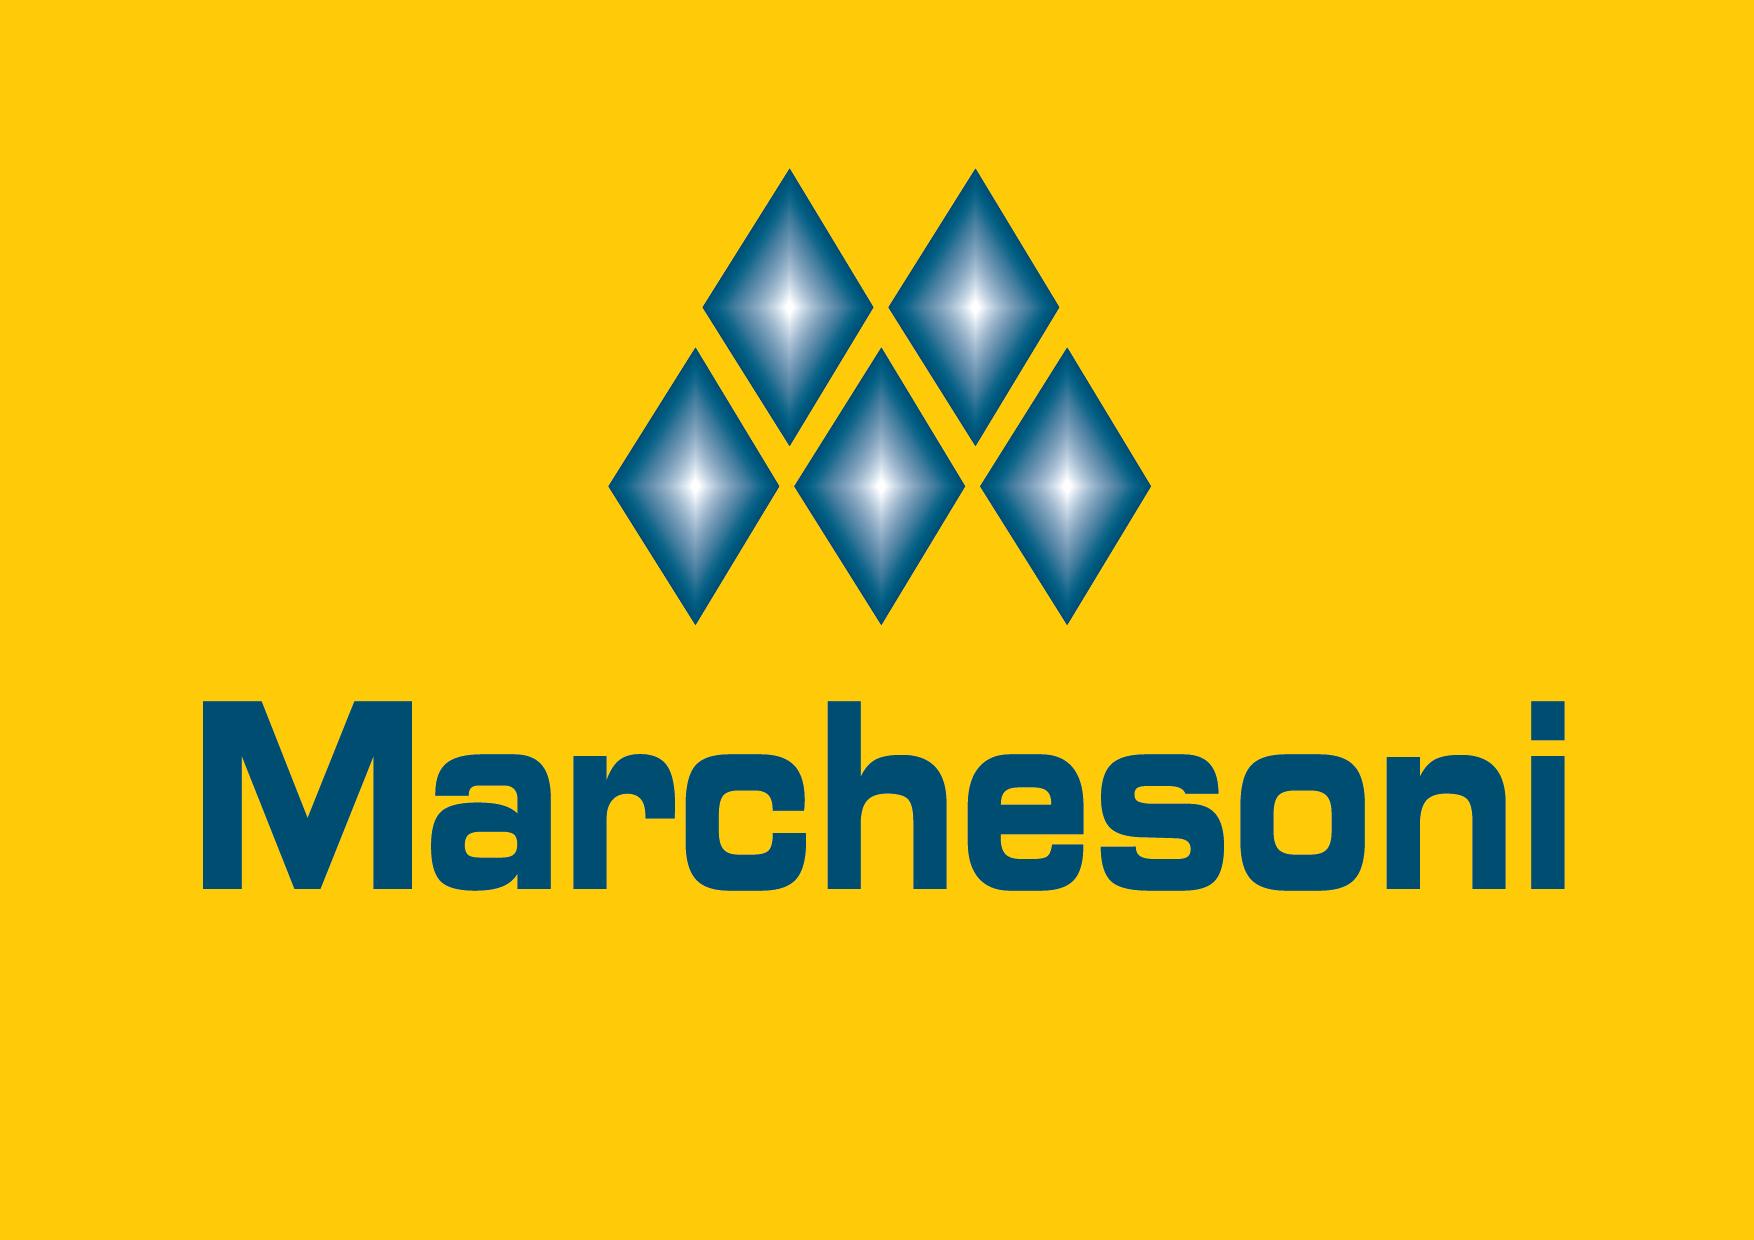 Esterilizador Marchesoni com 3 Bules em INOX - ES.1.391/392  - Carmel Equipamentos